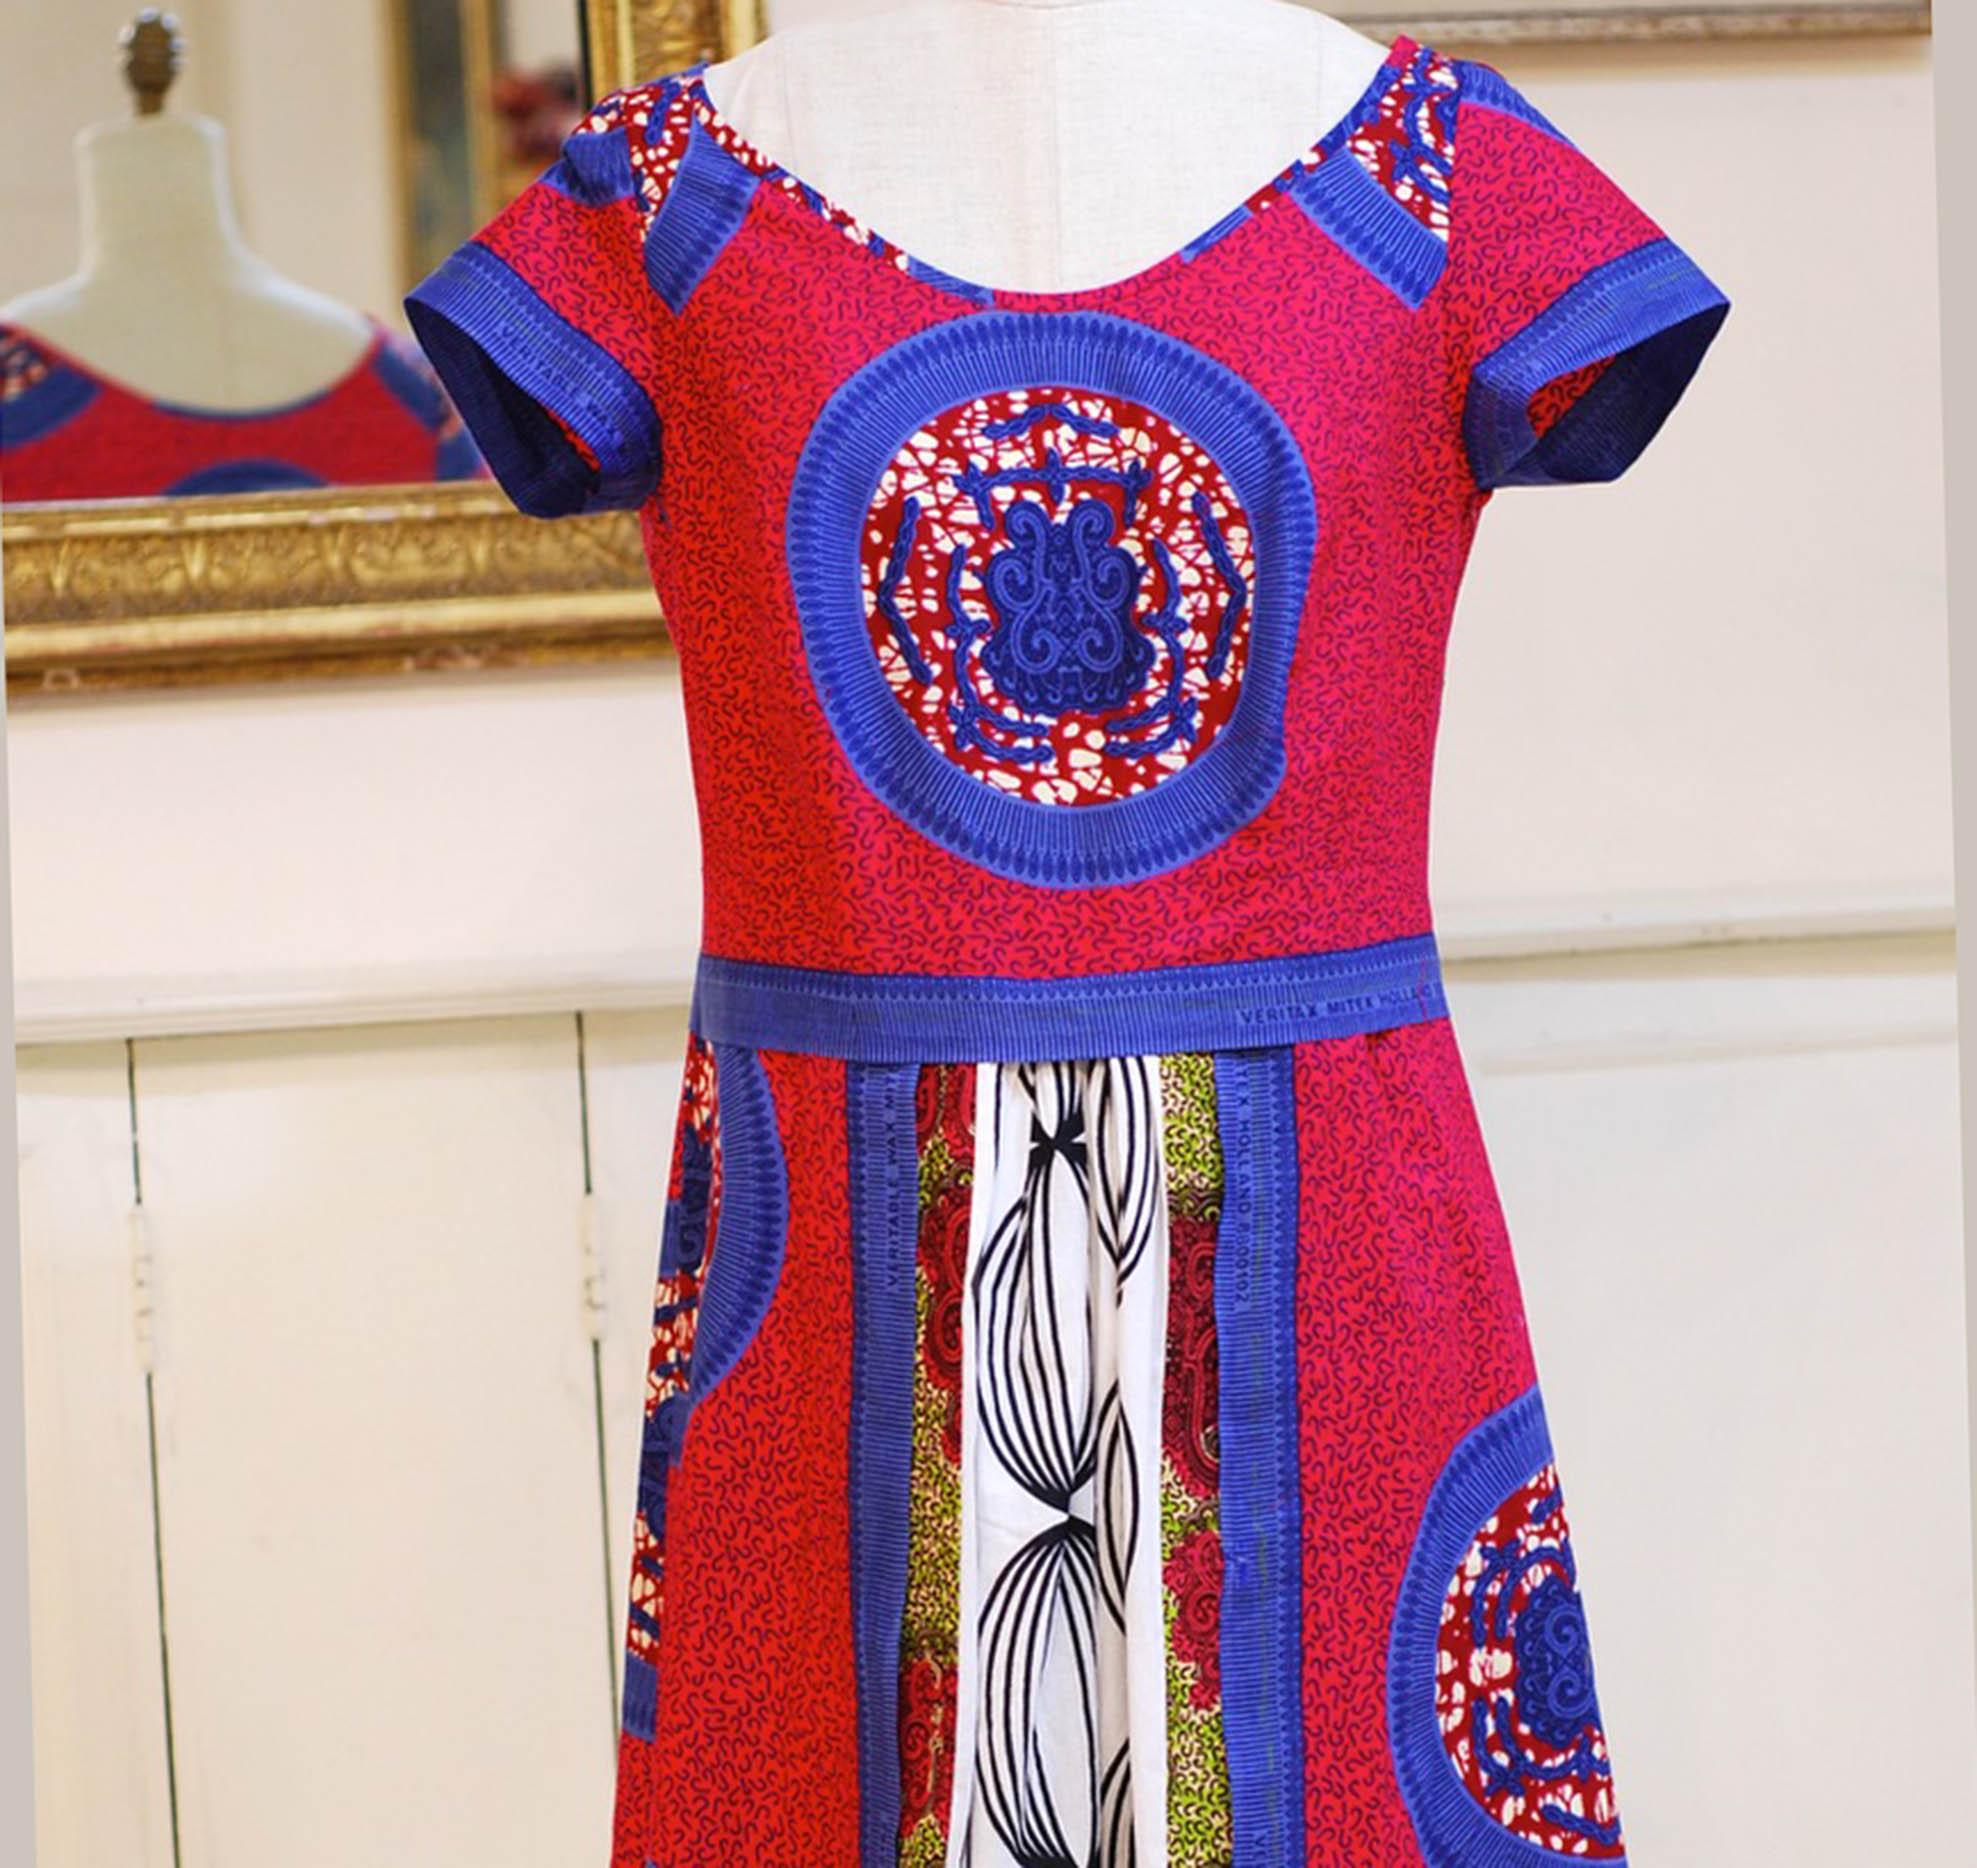 Marrekech Dress  - multi cotton dutch wax African Prints